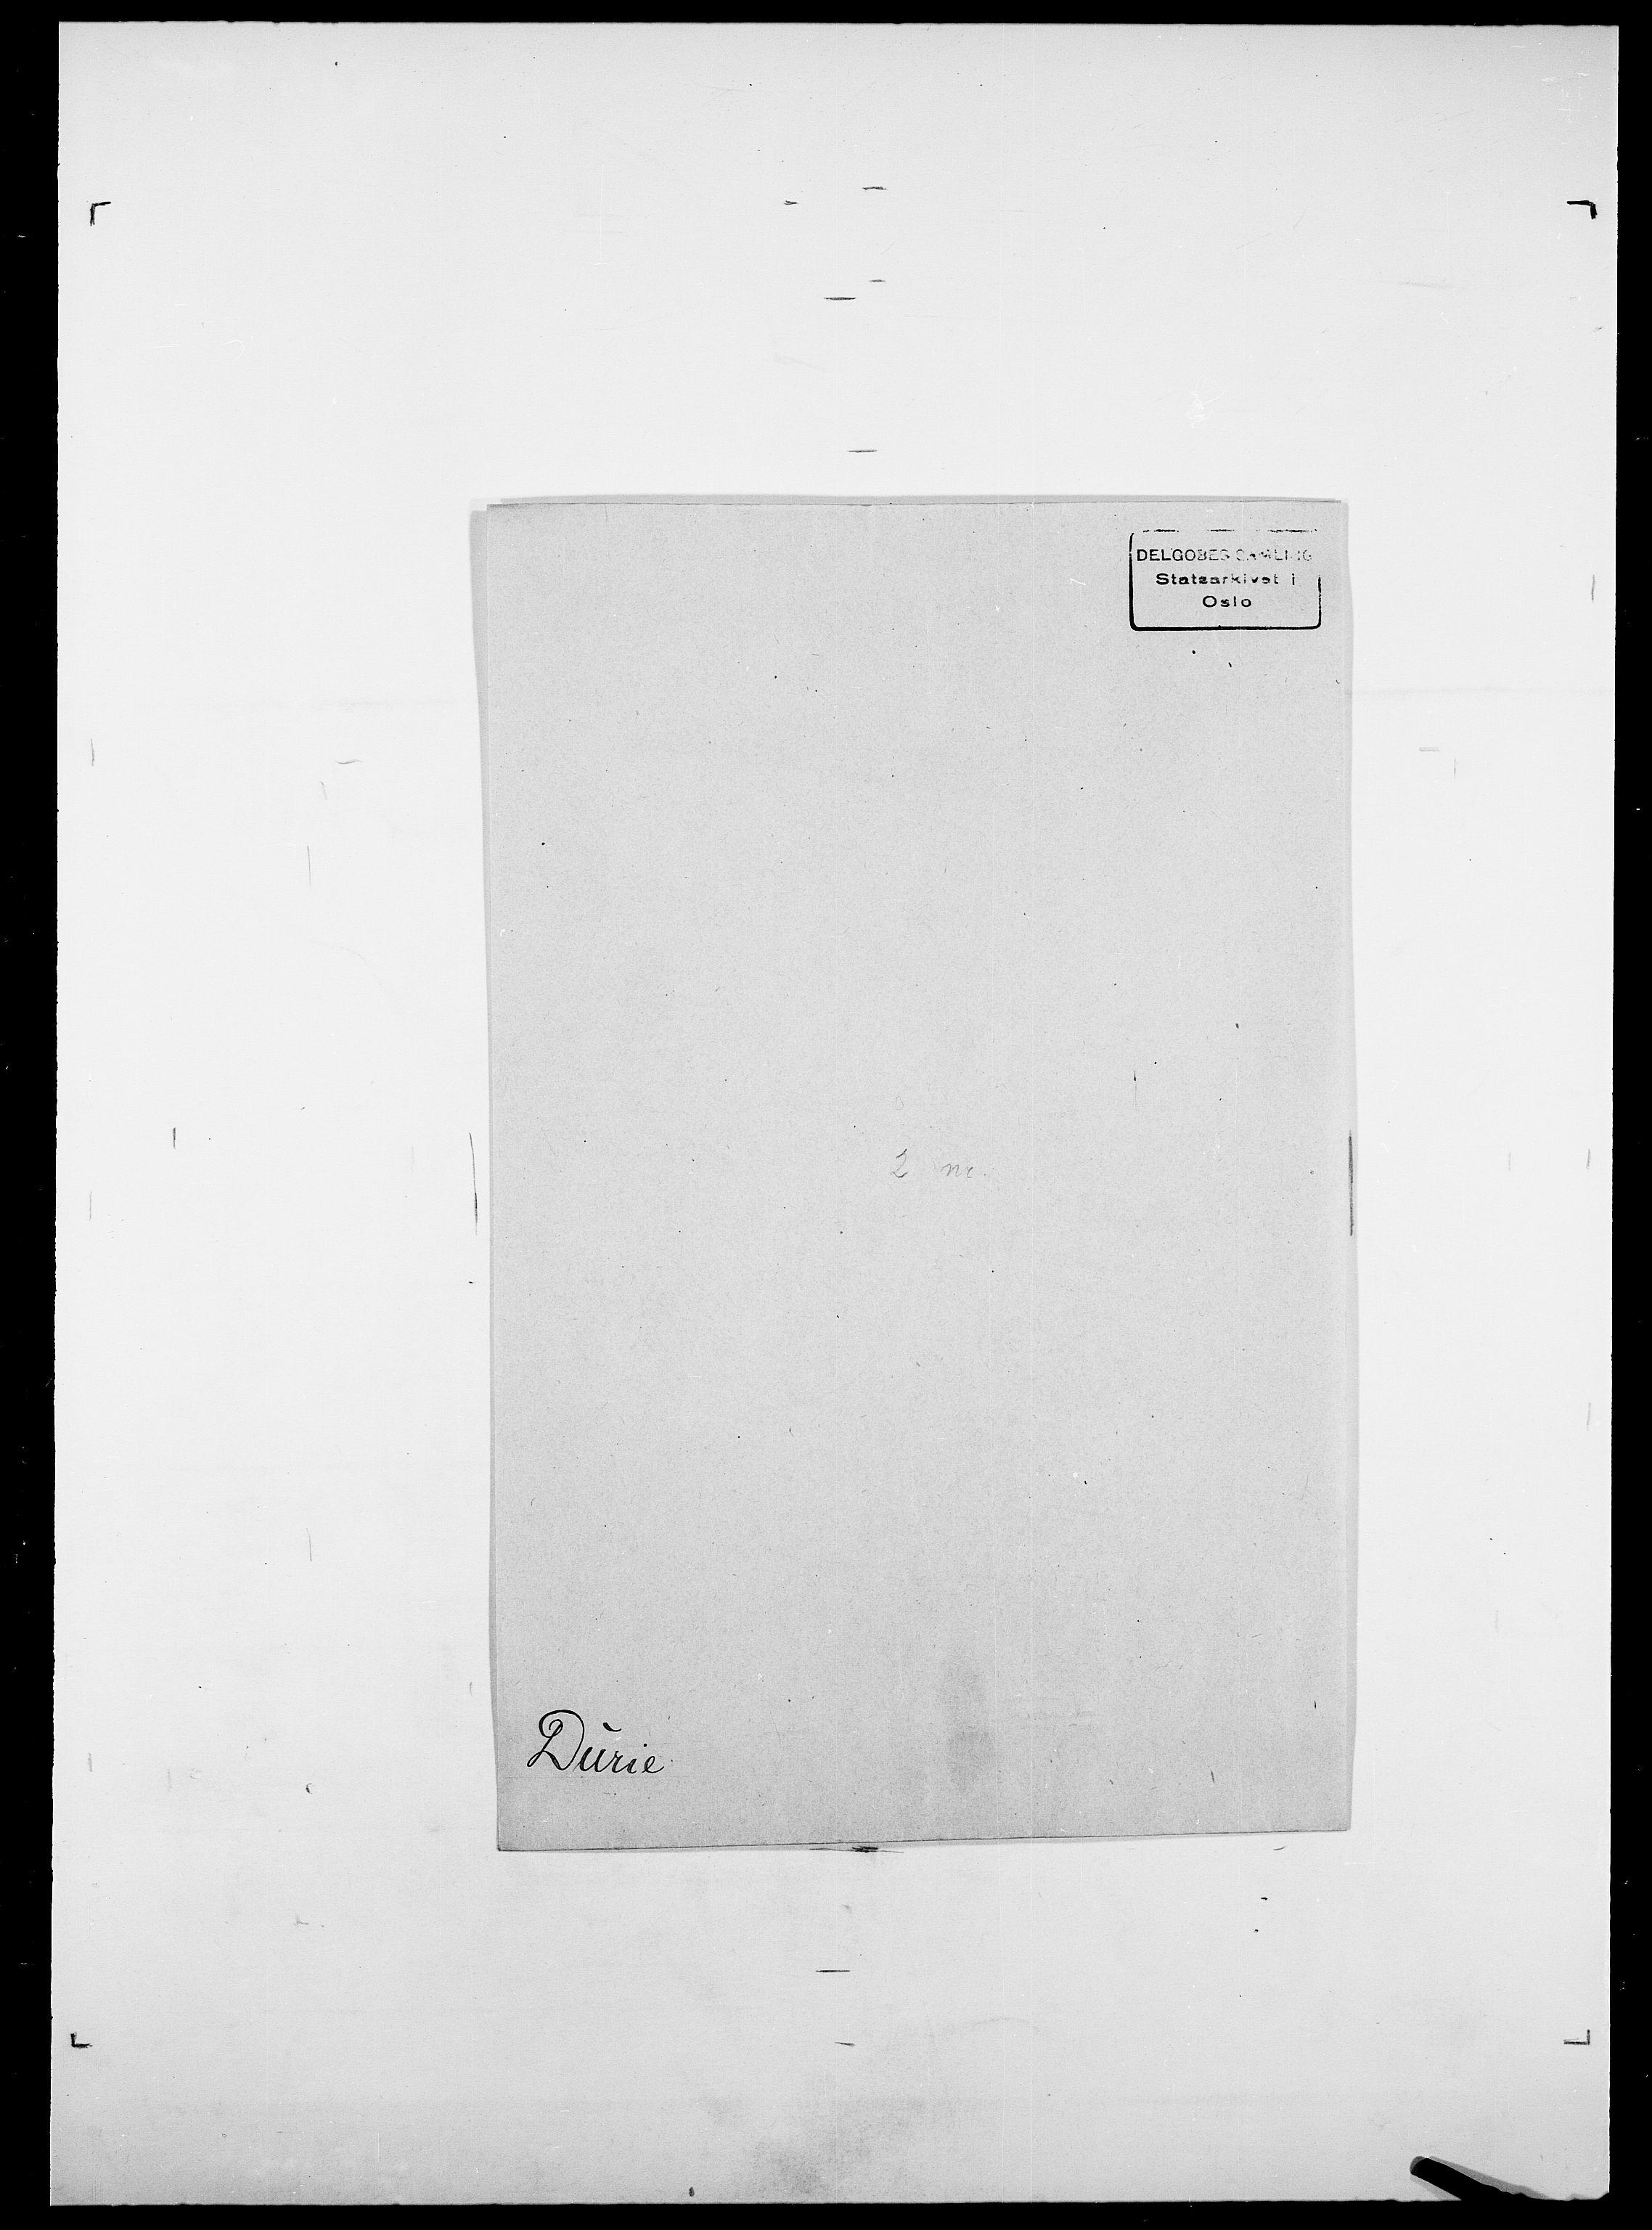 SAO, Delgobe, Charles Antoine - samling, D/Da/L0009: Dahl - v. Düren, s. 849